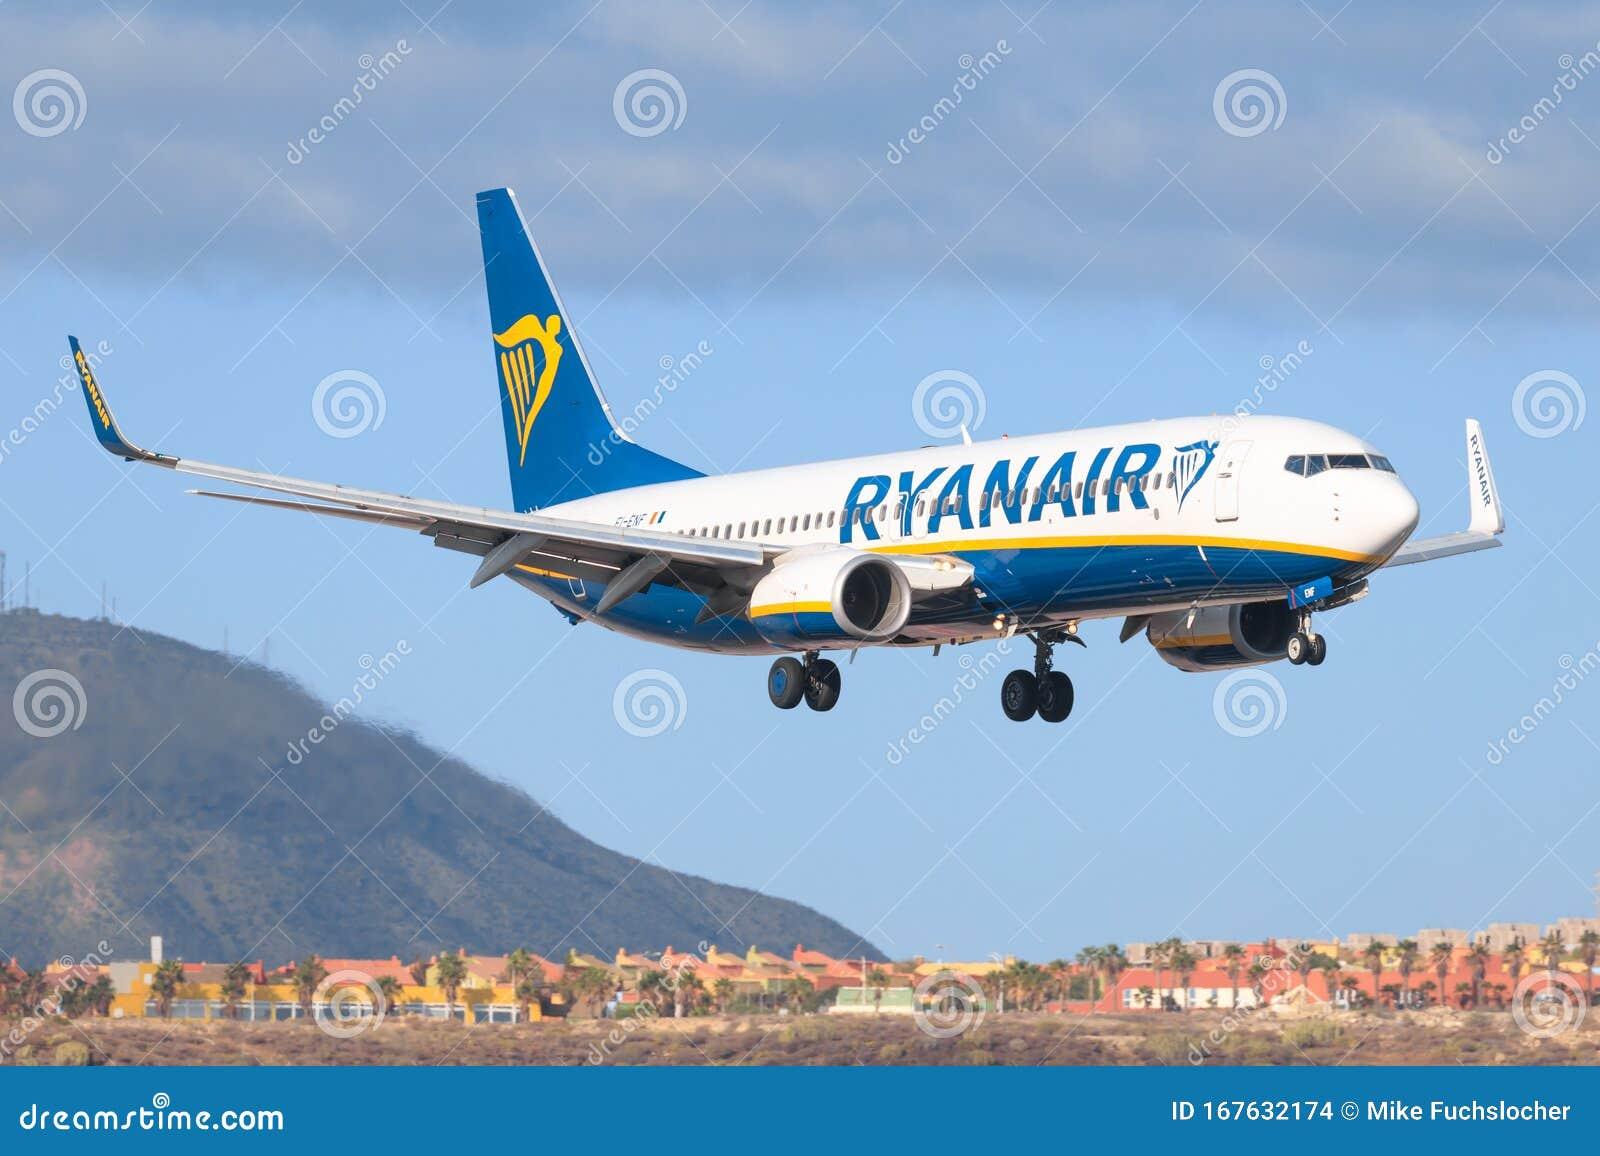 ryanair flights cheap flights tenerife south